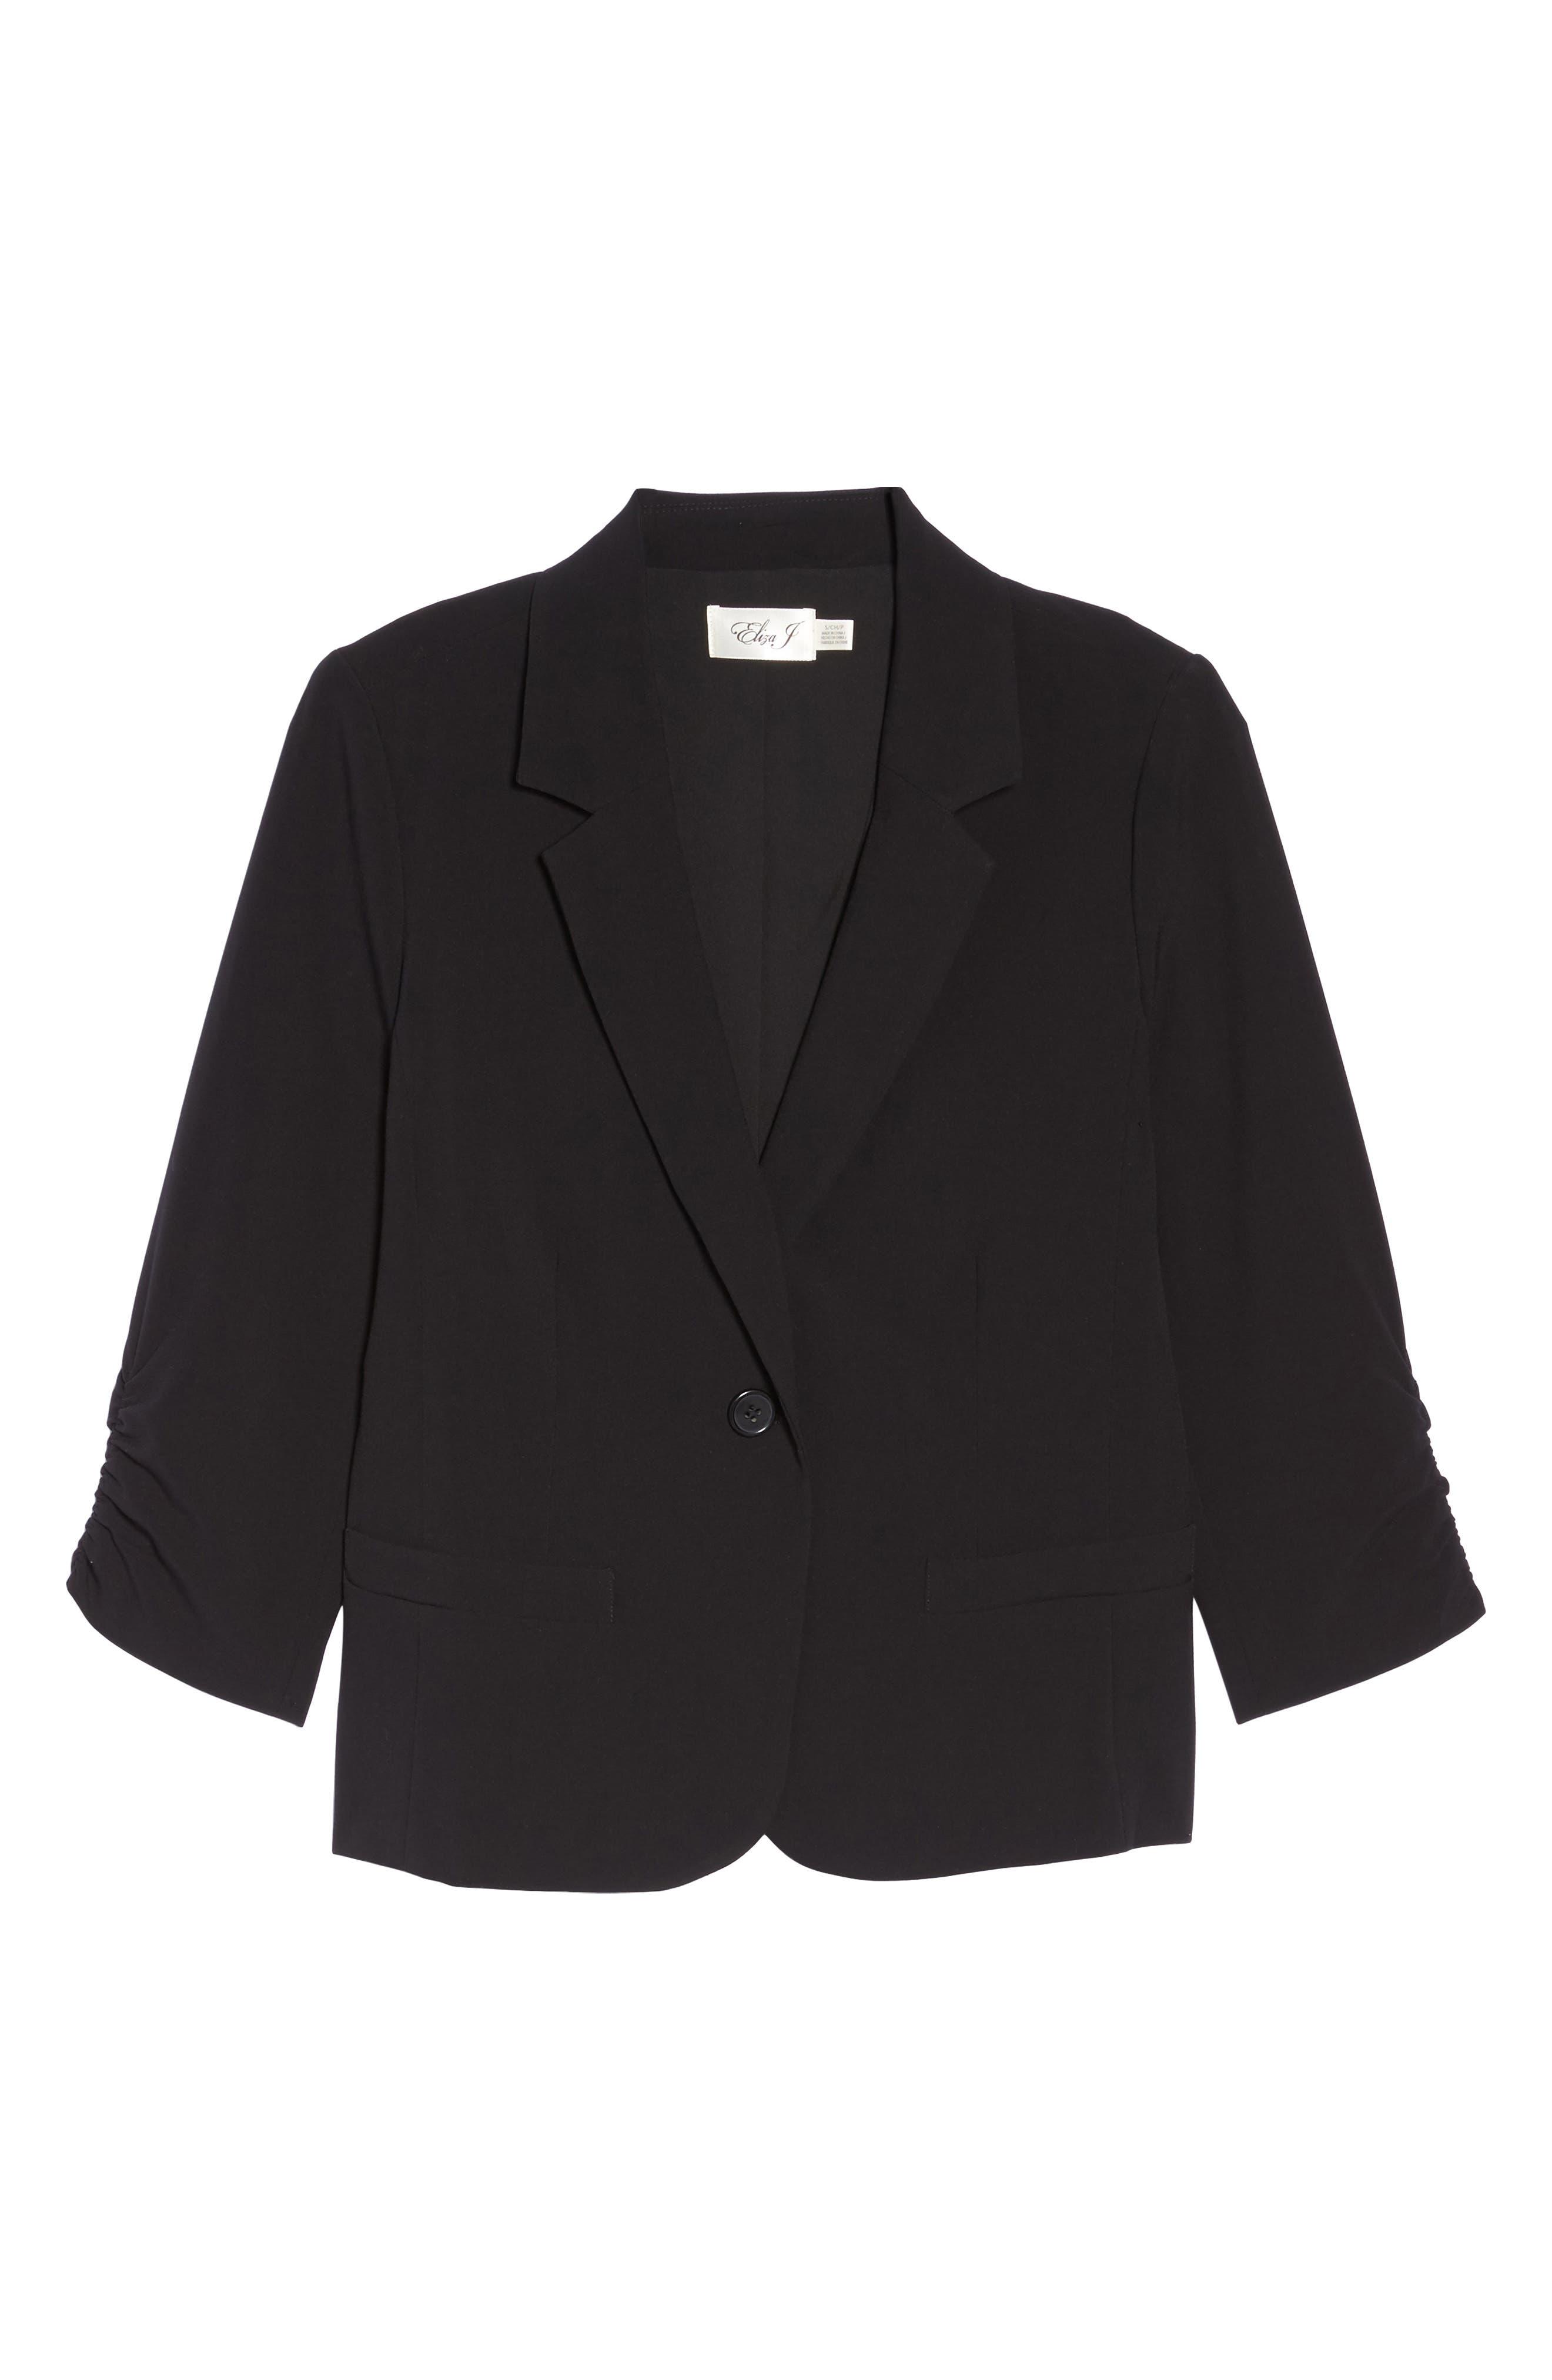 Ruched Sleeve Blazer,                             Alternate thumbnail 6, color,                             Black